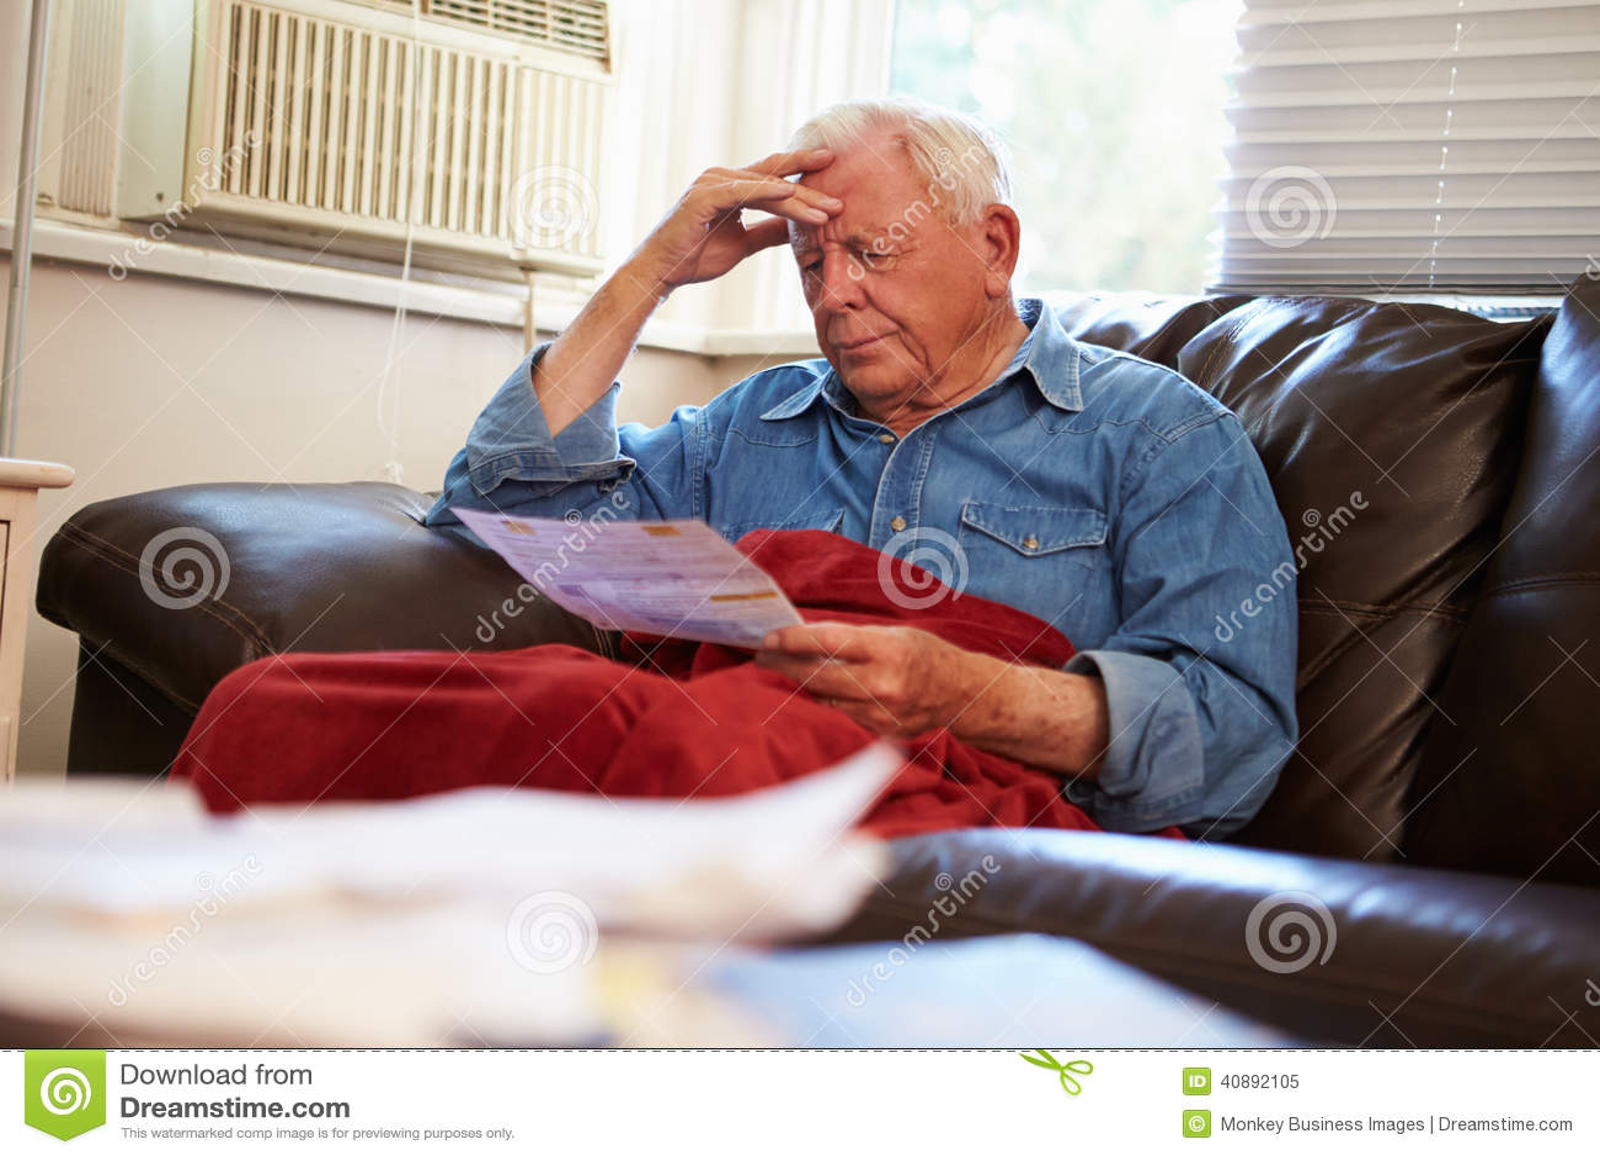 Ongerust gemaakte Hogere Mensenzitting op Sofa Looking At Bills